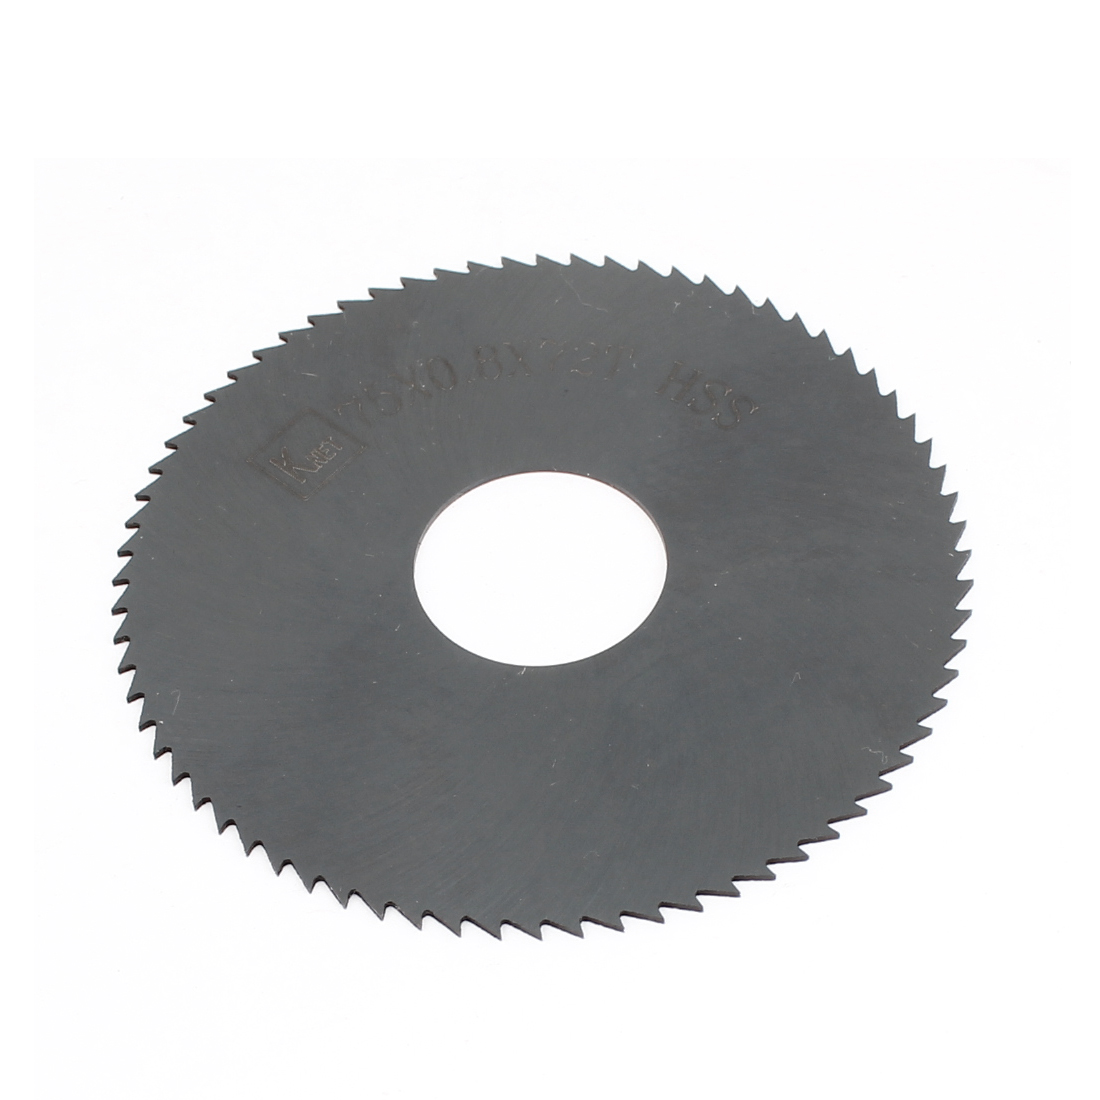 HSS 72 Teeth 75mm x 0.8mm x 16mm Slitting Saw Blade Spare Part